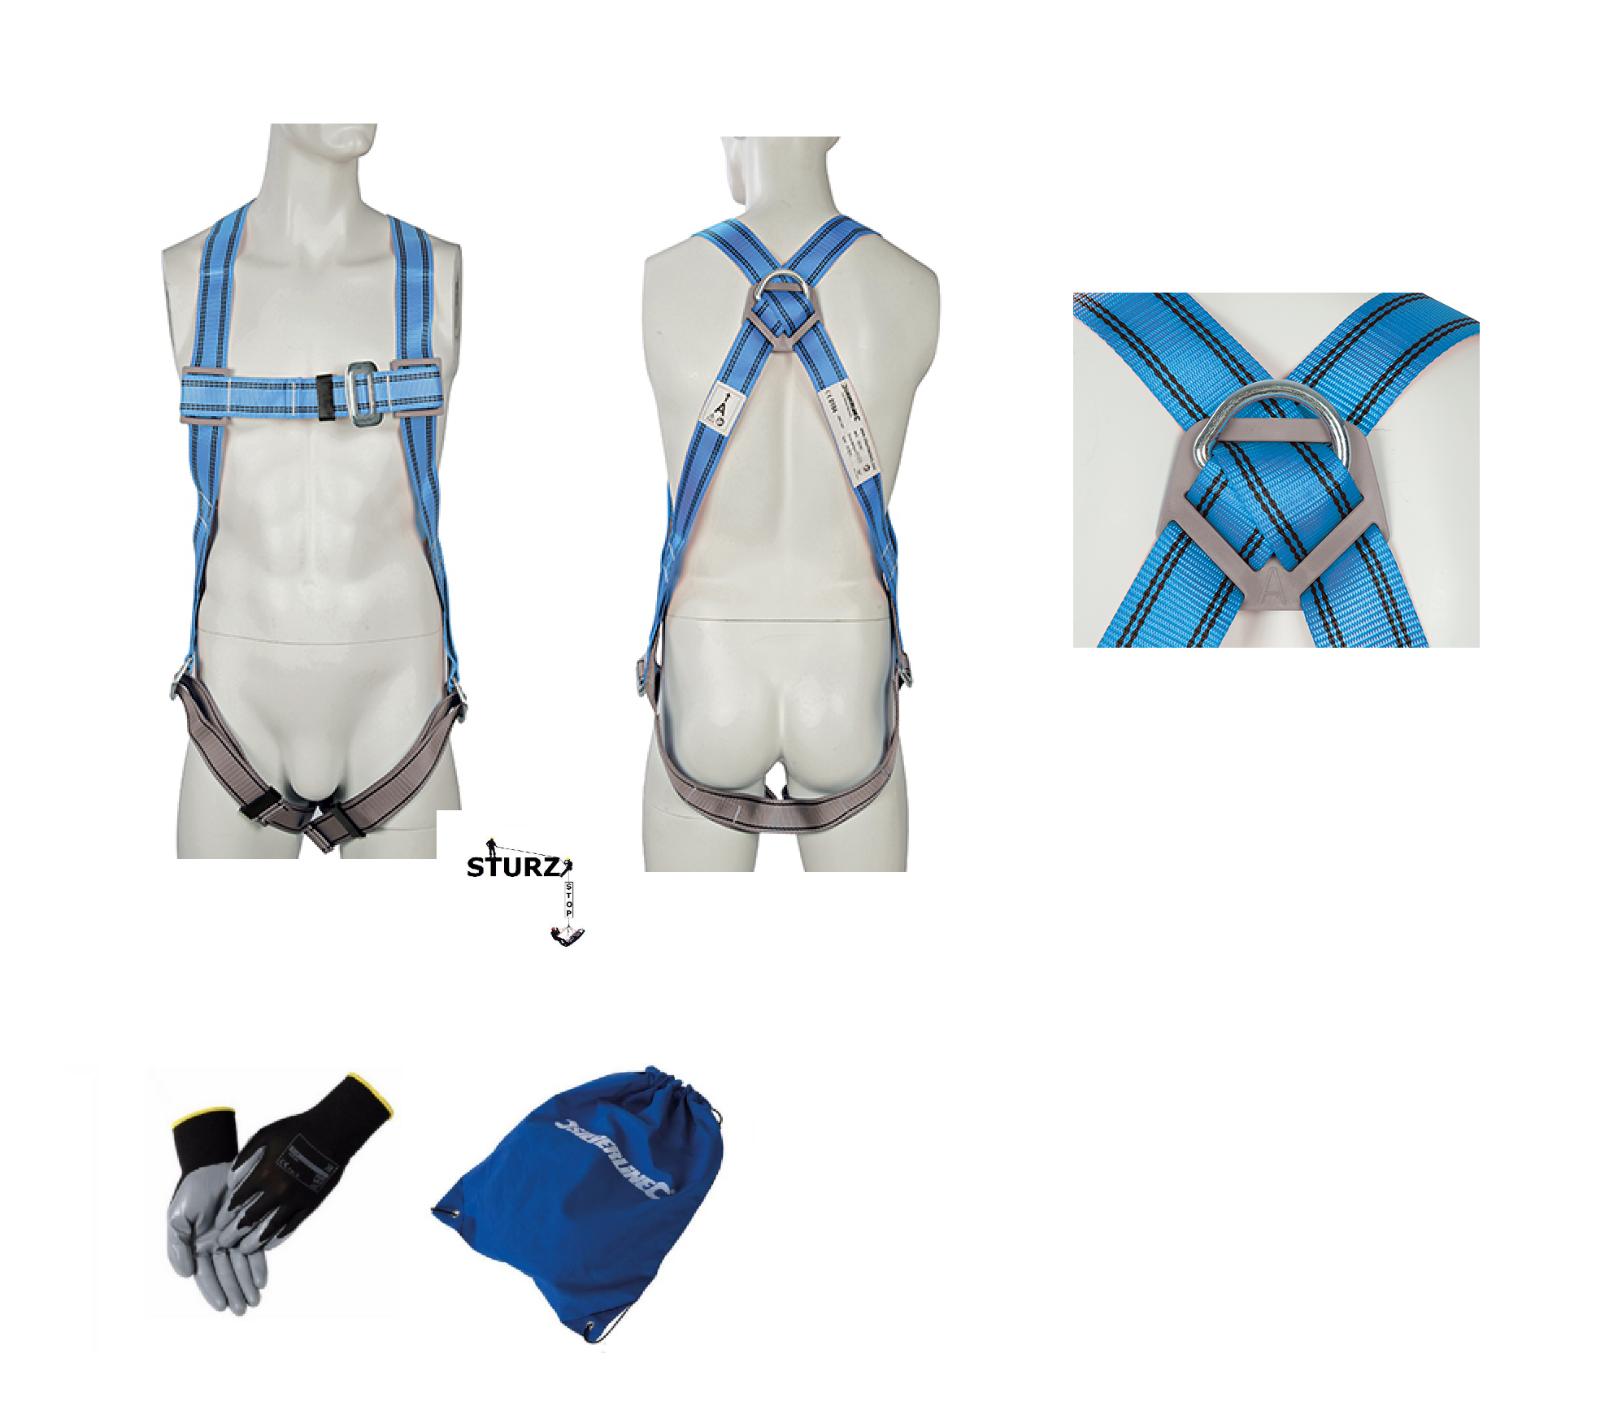 Profi Sicherheitsgurt Atex25 Auffanggurt Fallschutz Absturzsicherung Klettergurt